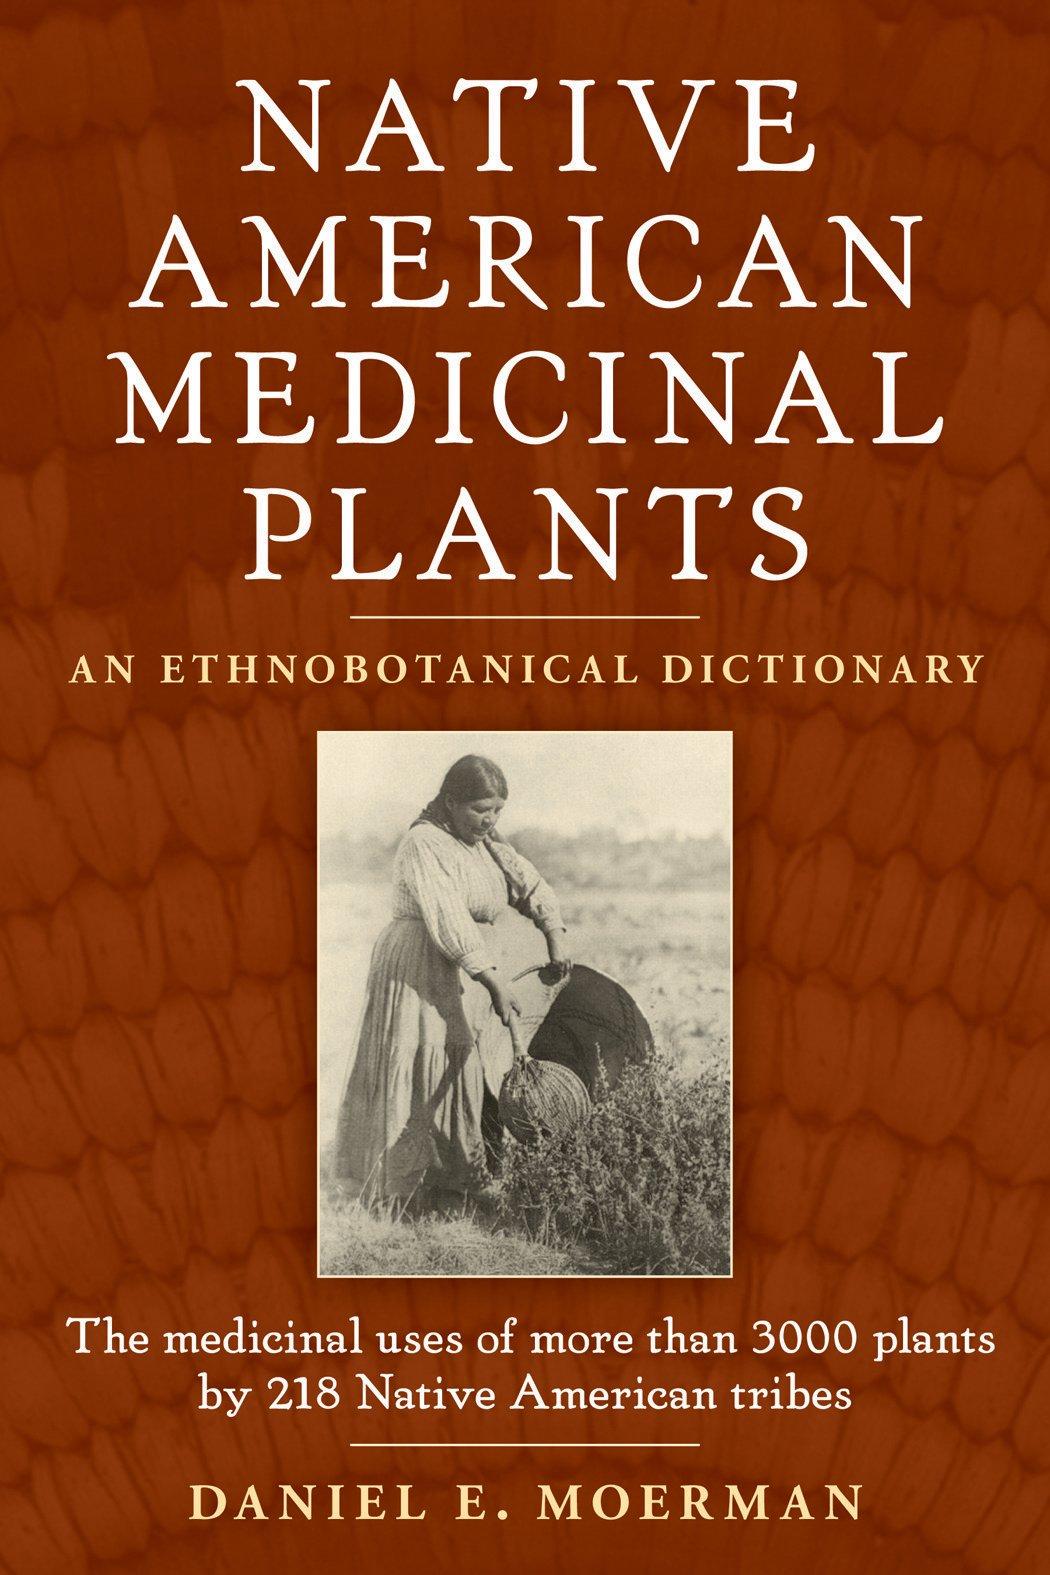 Native American Medicinal Plants- $29.95